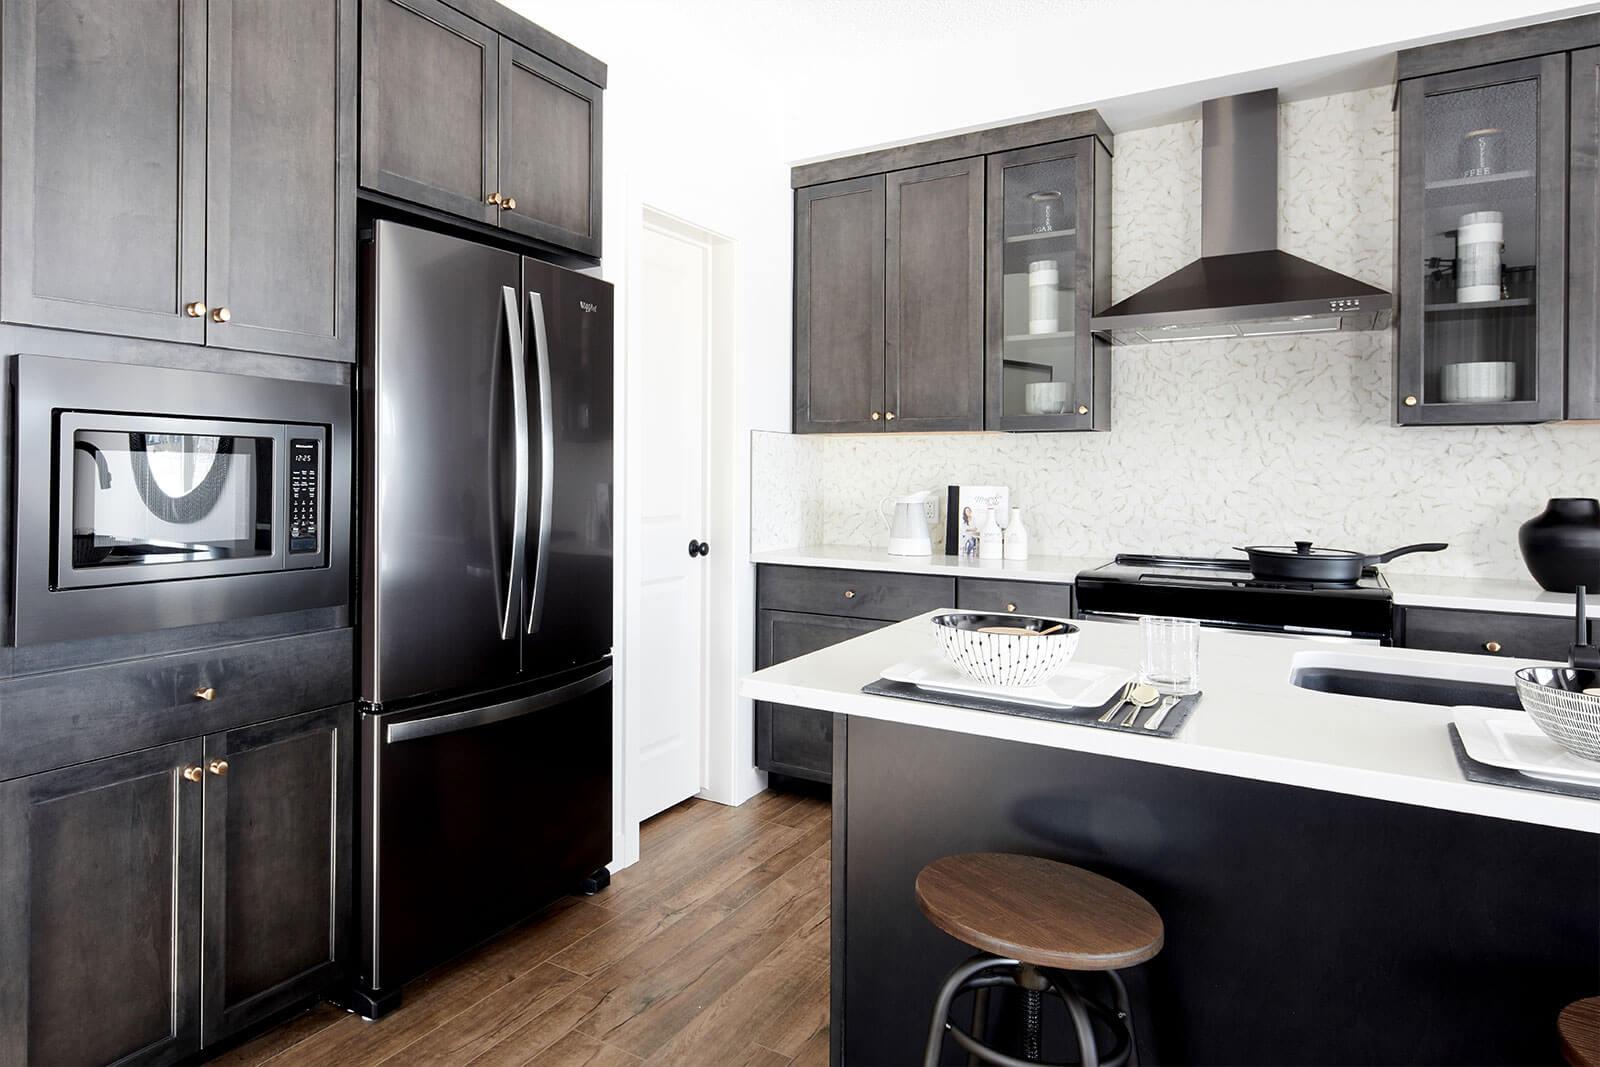 New Calgary Single Family Home Rohan 1 in Shawnee Park, located at 6 Savanna Gardens NE Built By Cardel Homes Calgary